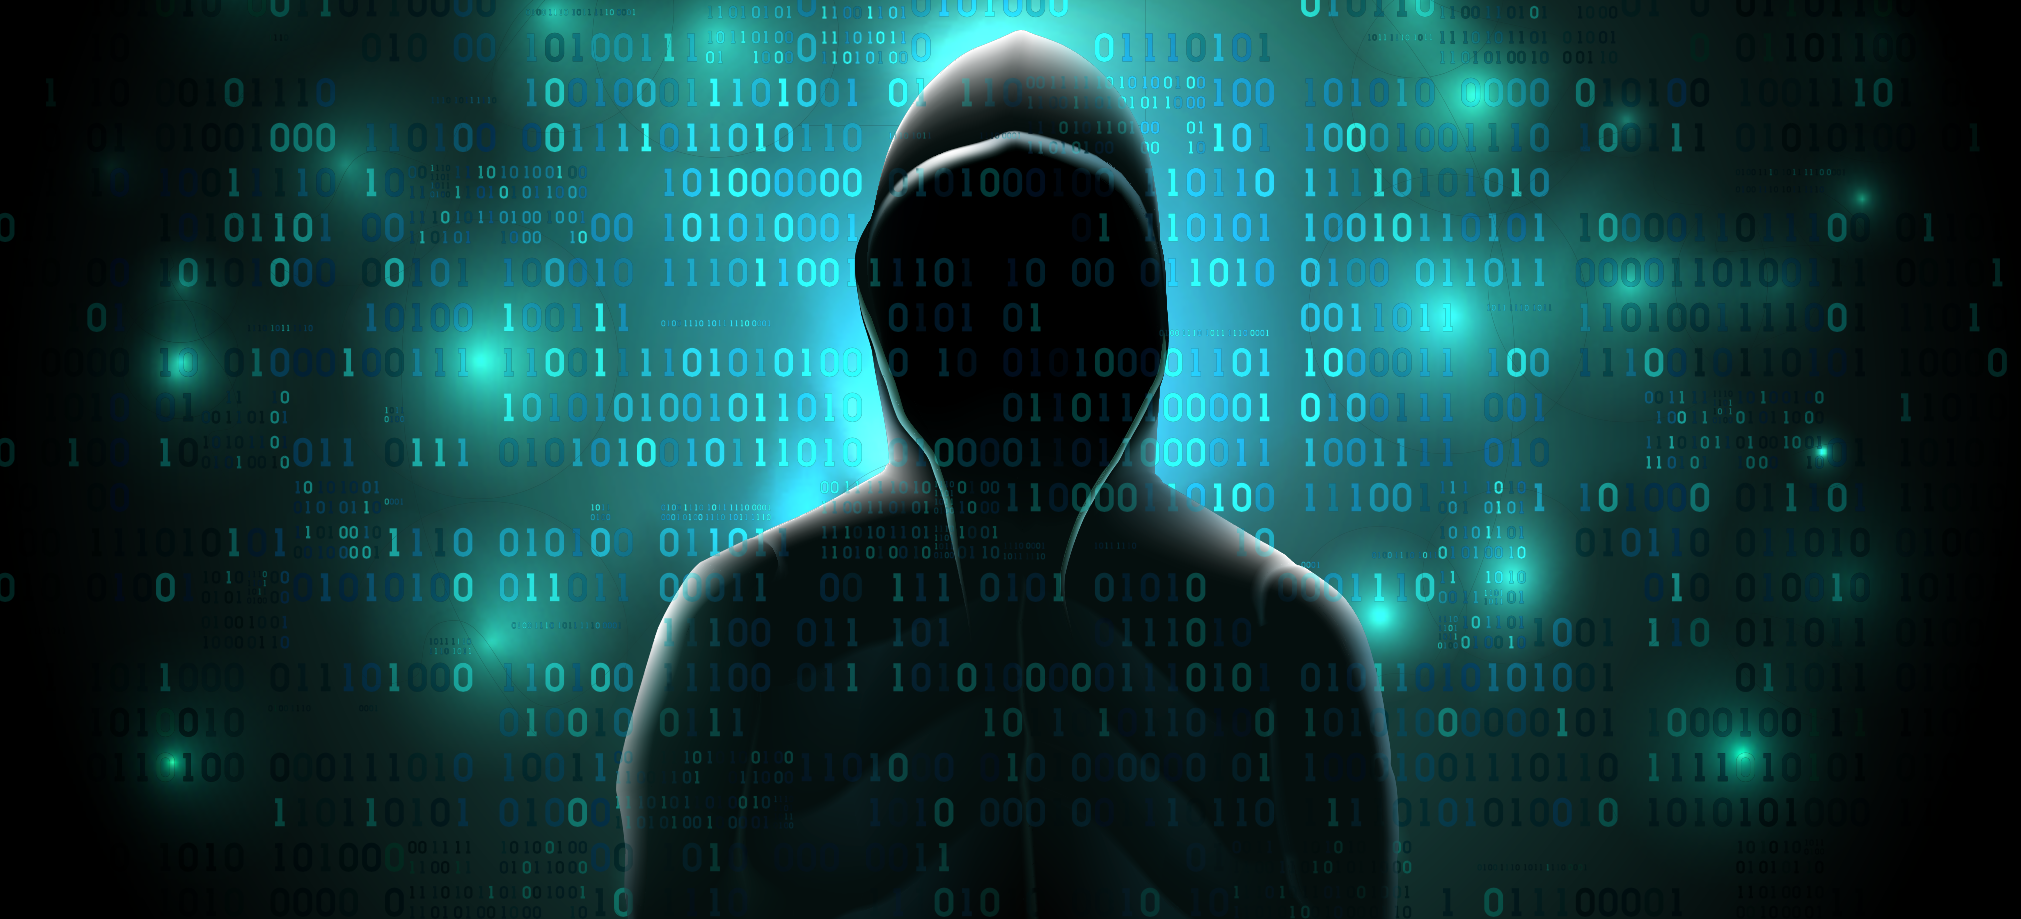 https: img-z.okeinfo.net content 2019 05 19 92 2057607 4-tips-agar-smartphone-anda-aman-dari-serangan-hacker-mHYdDkJVot.png